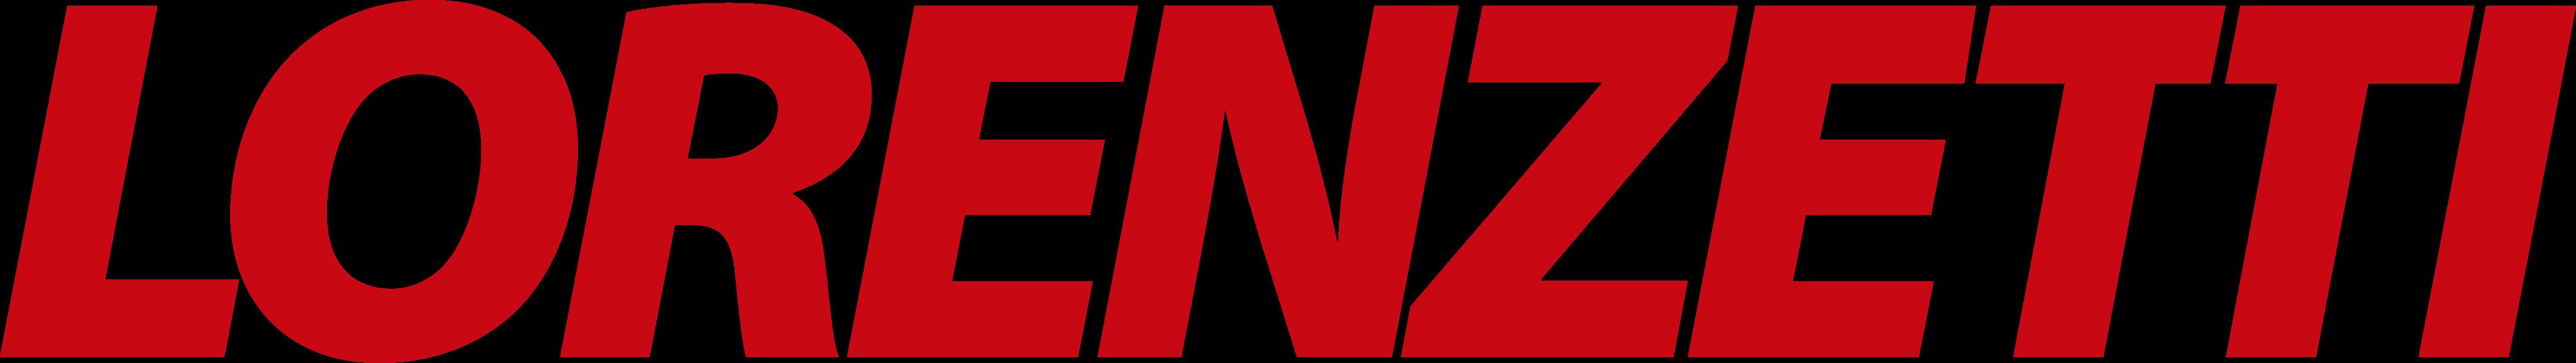 lorenzetti-logo-1